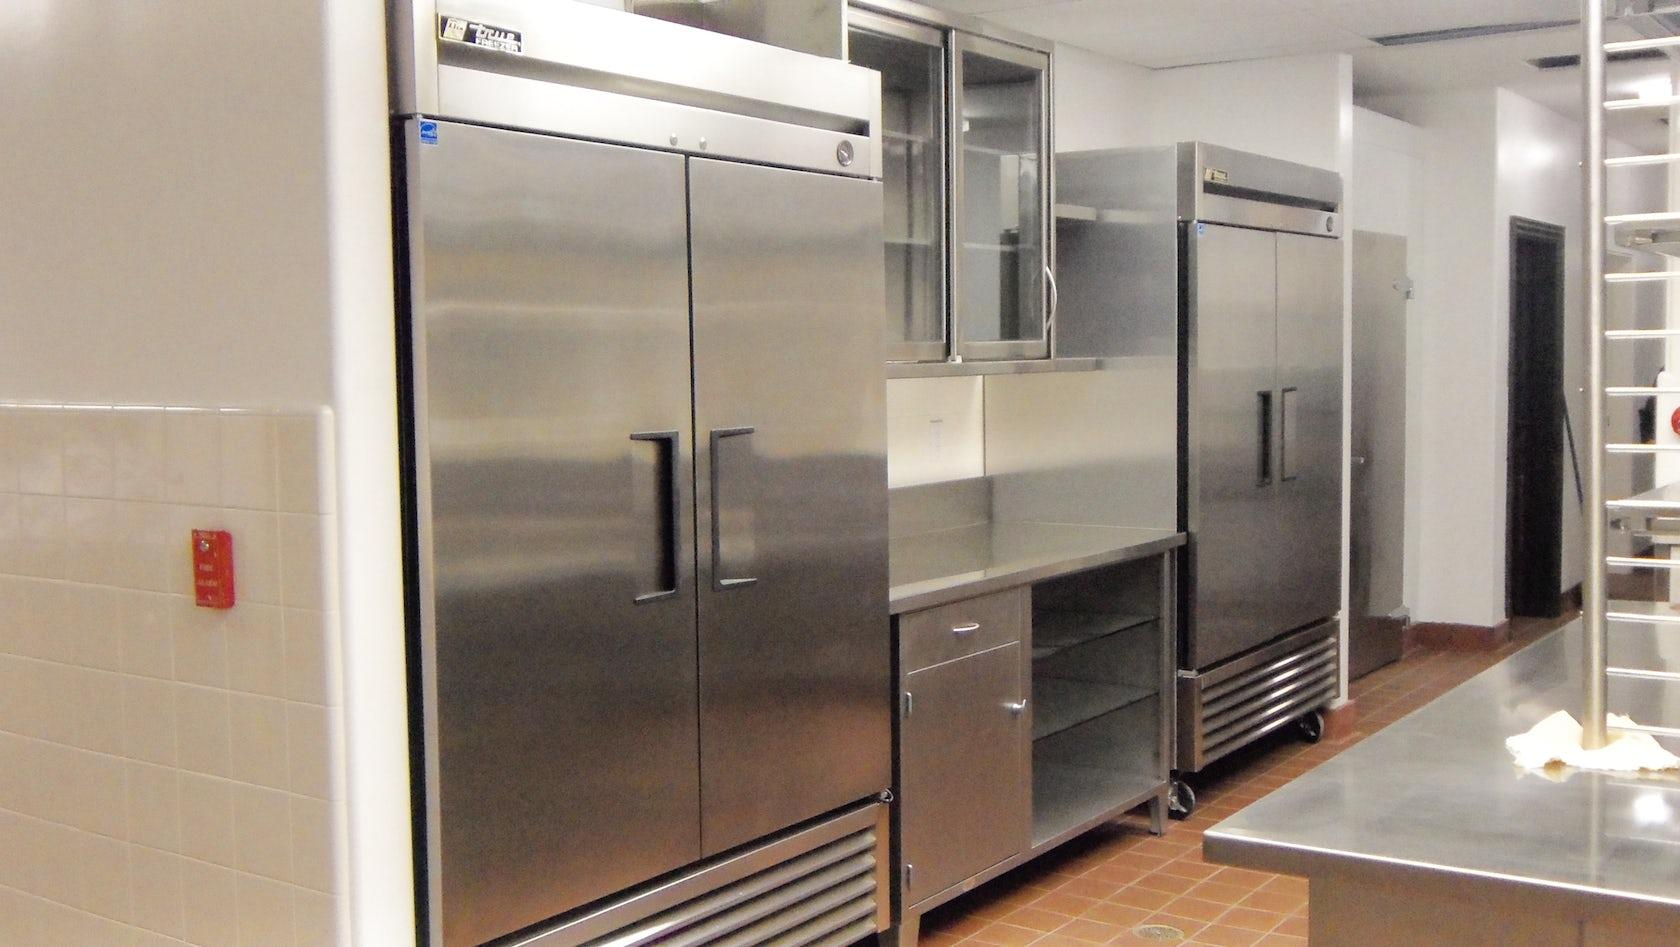 Design build commercial kitchen architizer for Commercial kitchen design regulations